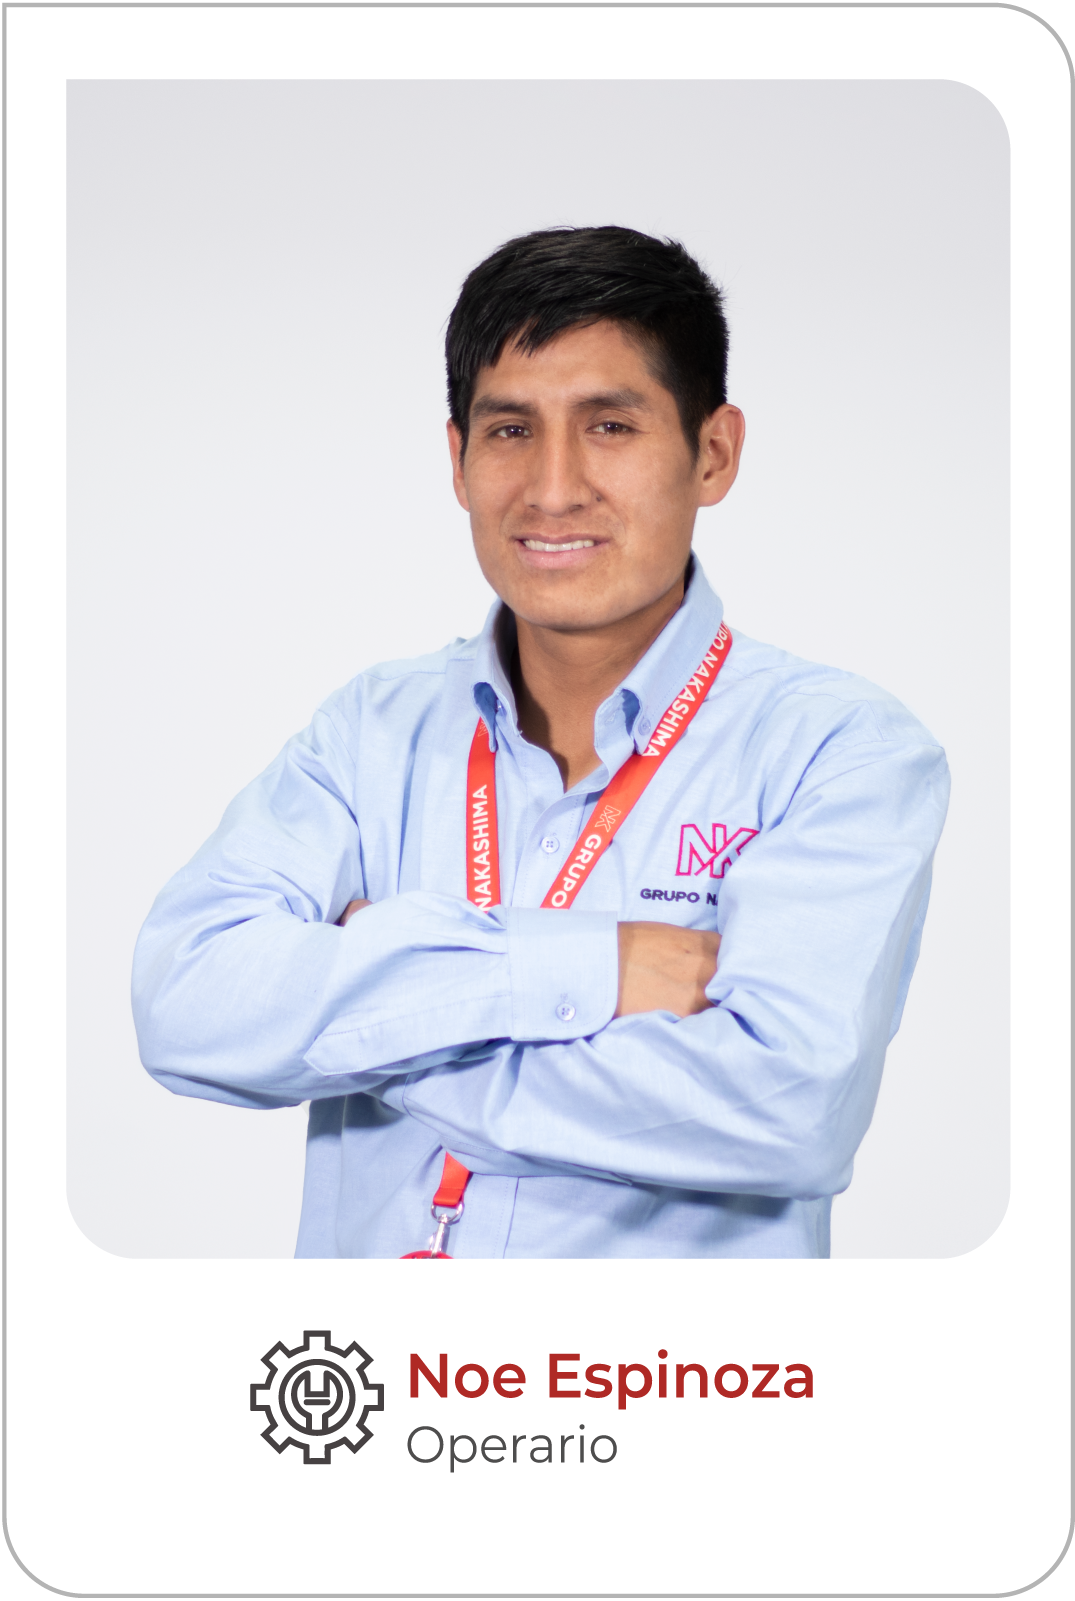 web 2021_Personal - Noe Espinoza